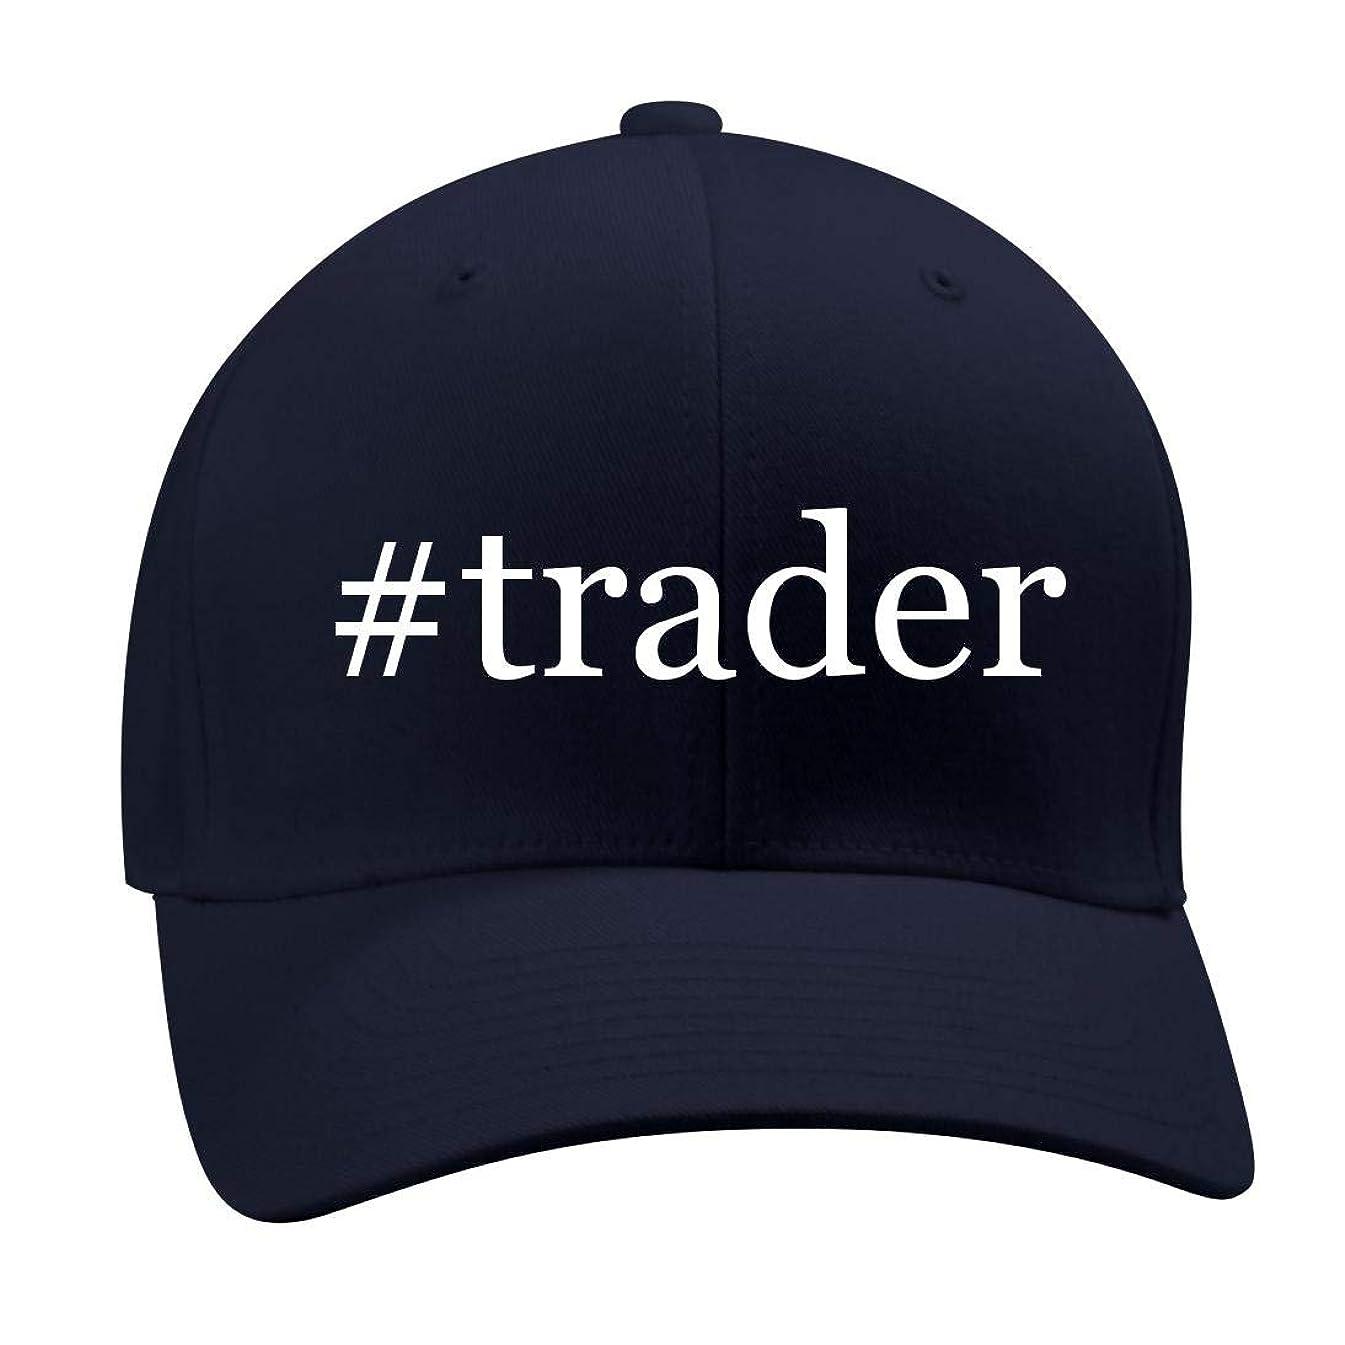 Shirt Me Up #Trader - A Nice Hashtag Men's Adult Baseball Hat Cap